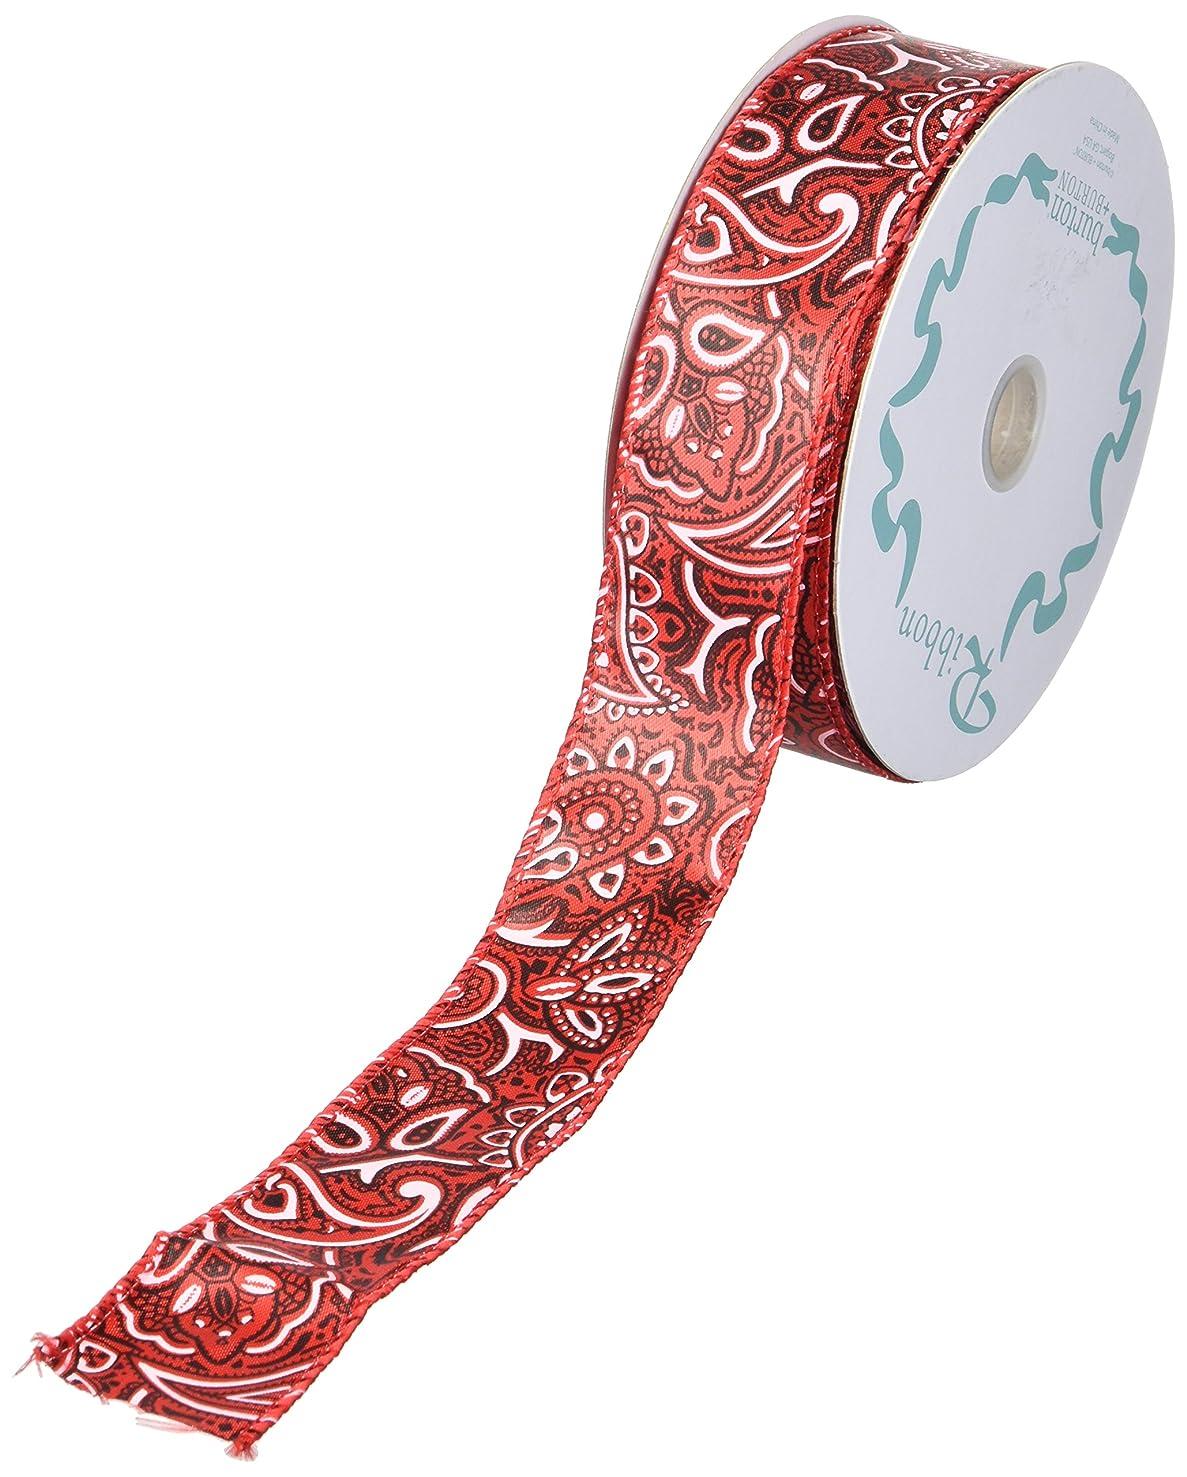 Western Bandana Pattern on Red Satin Ribbon, 20 Yard Roll